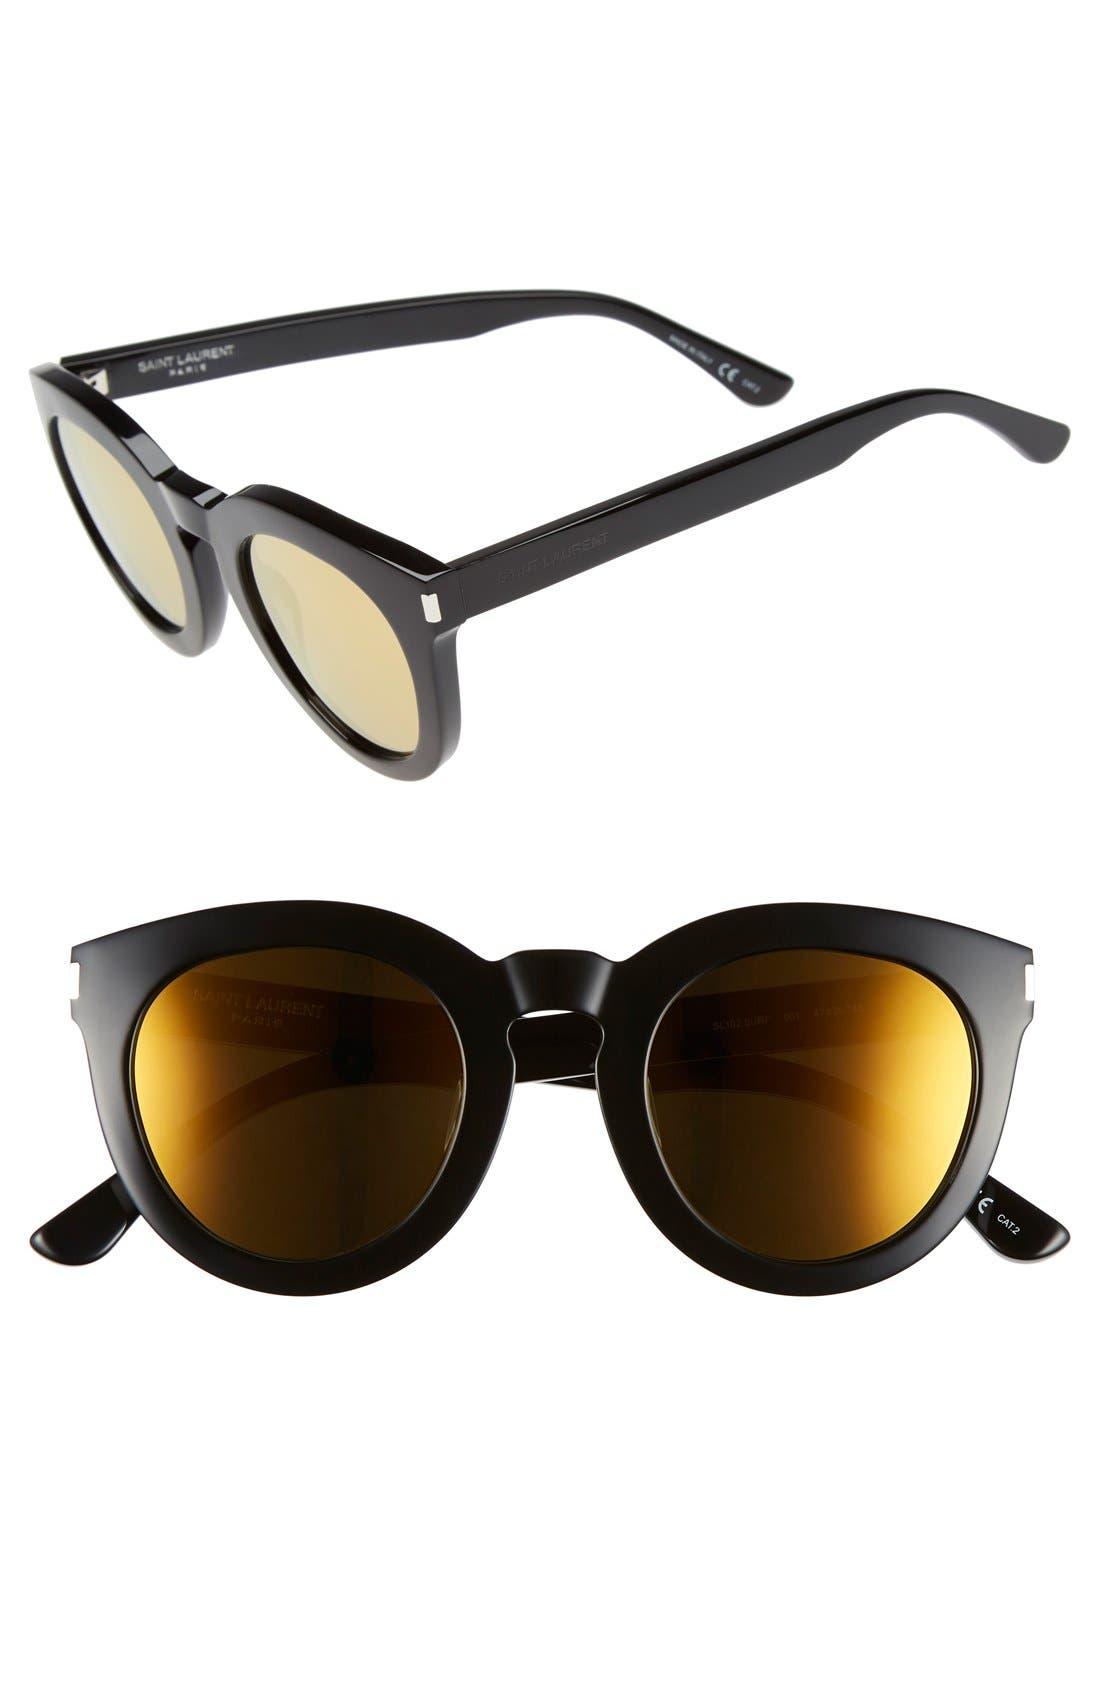 SAINT LAURENT '102 Surf' 47mm Retro Sunglasses